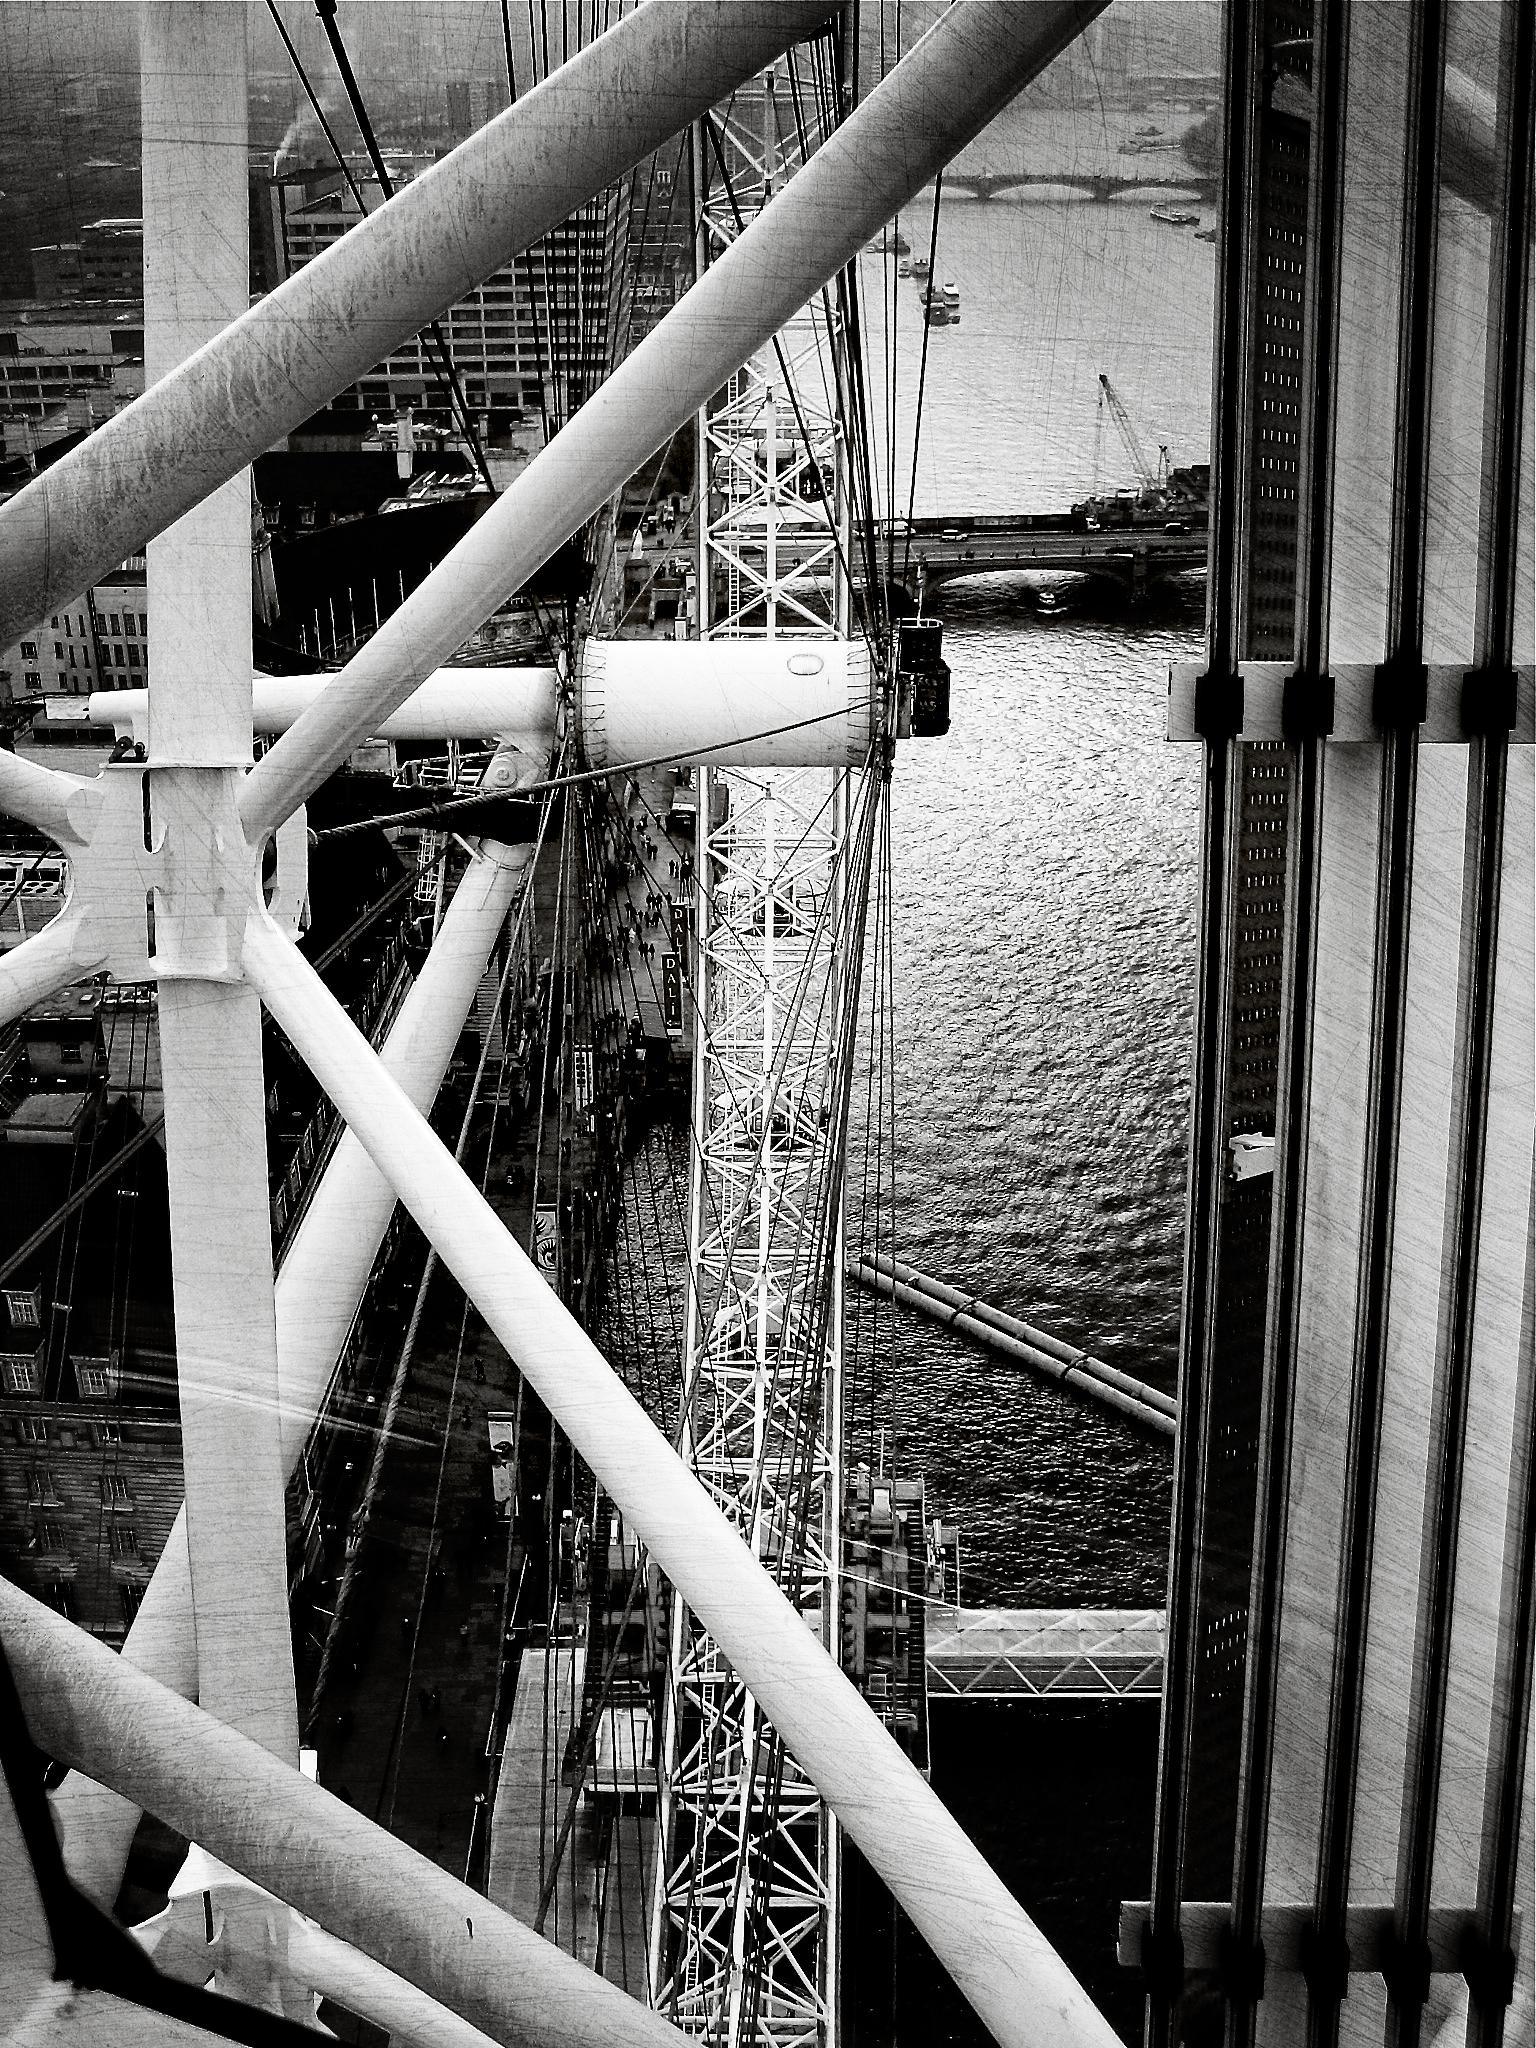 The London Eye by sg design